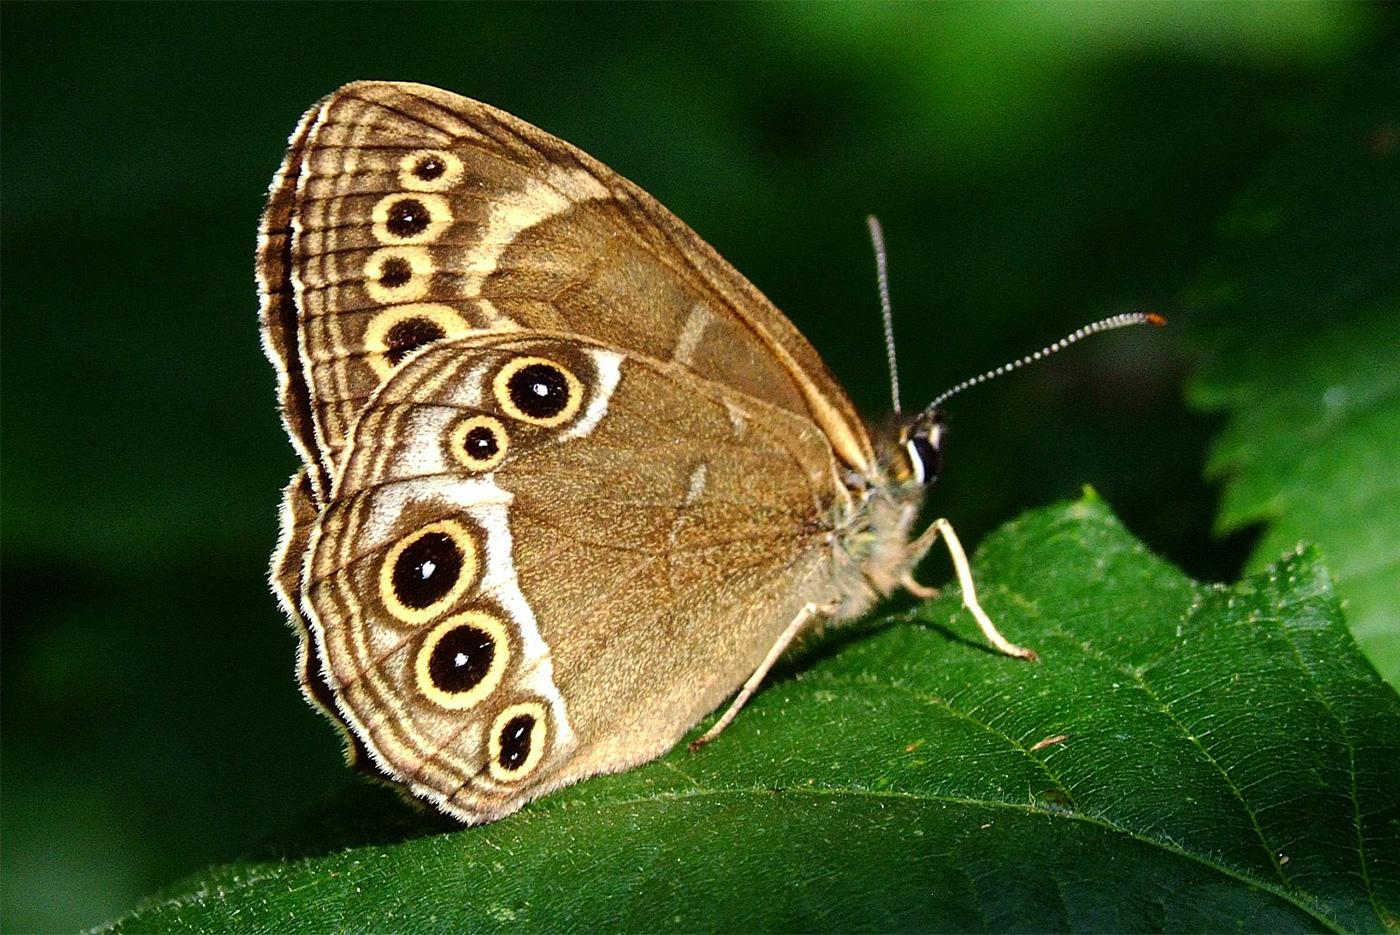 Schmetterling datiert